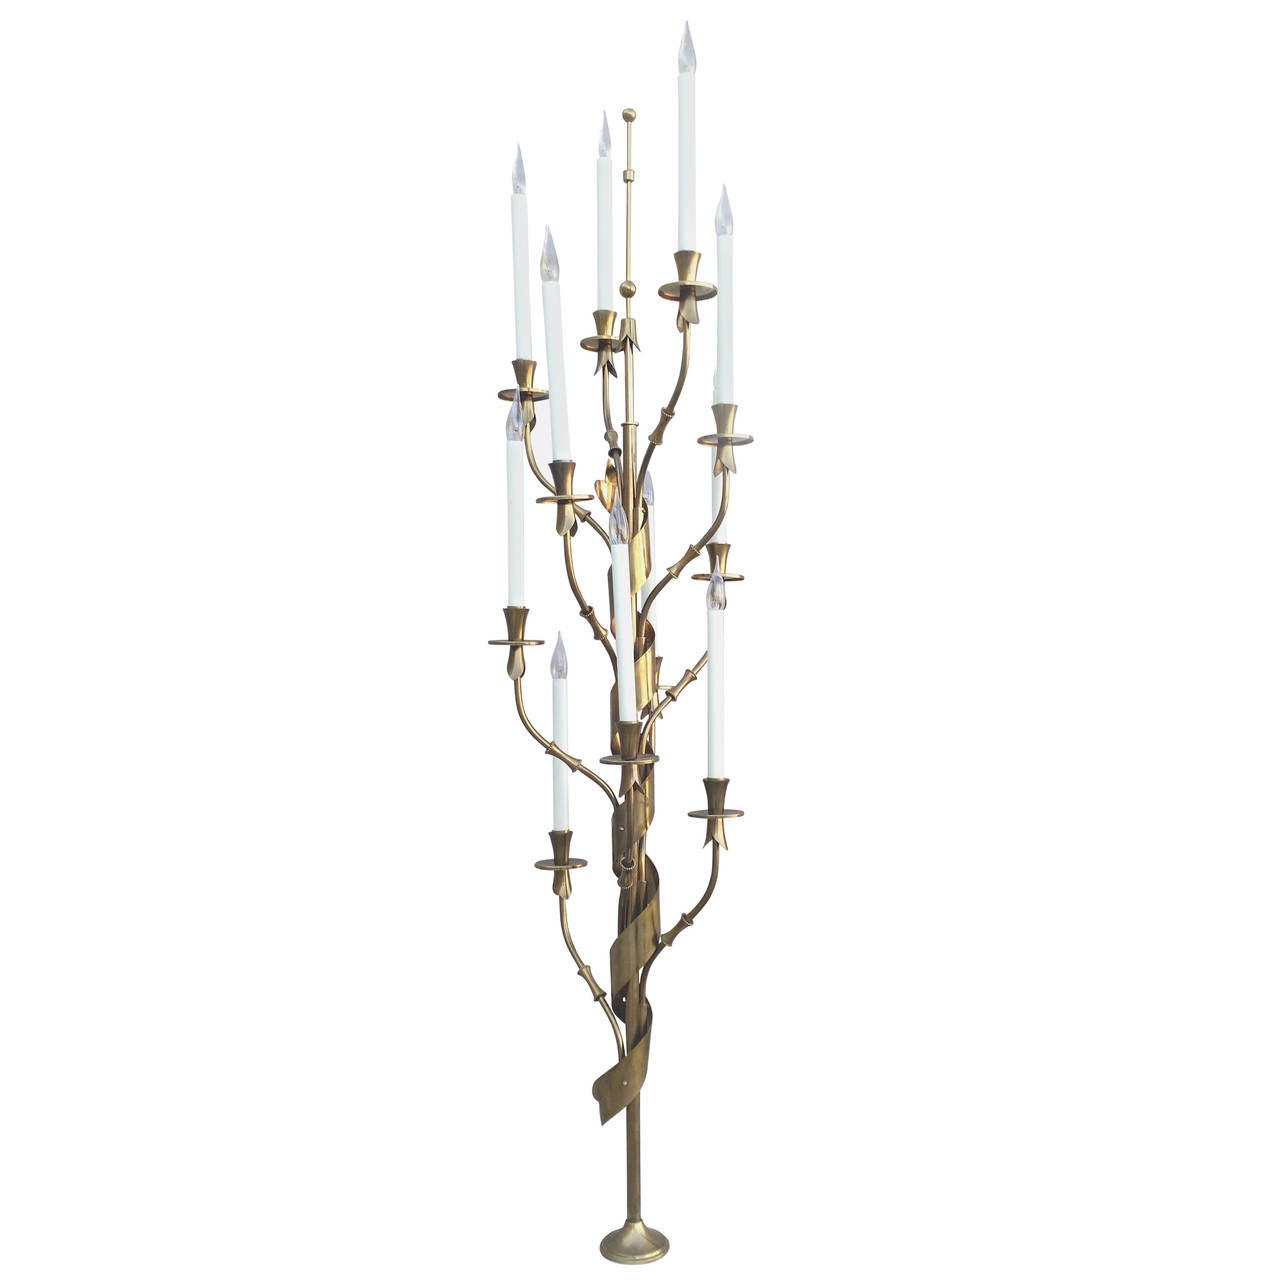 Hollywood Regency Stilnovo Italy Standing Candelabra Floor Lamp